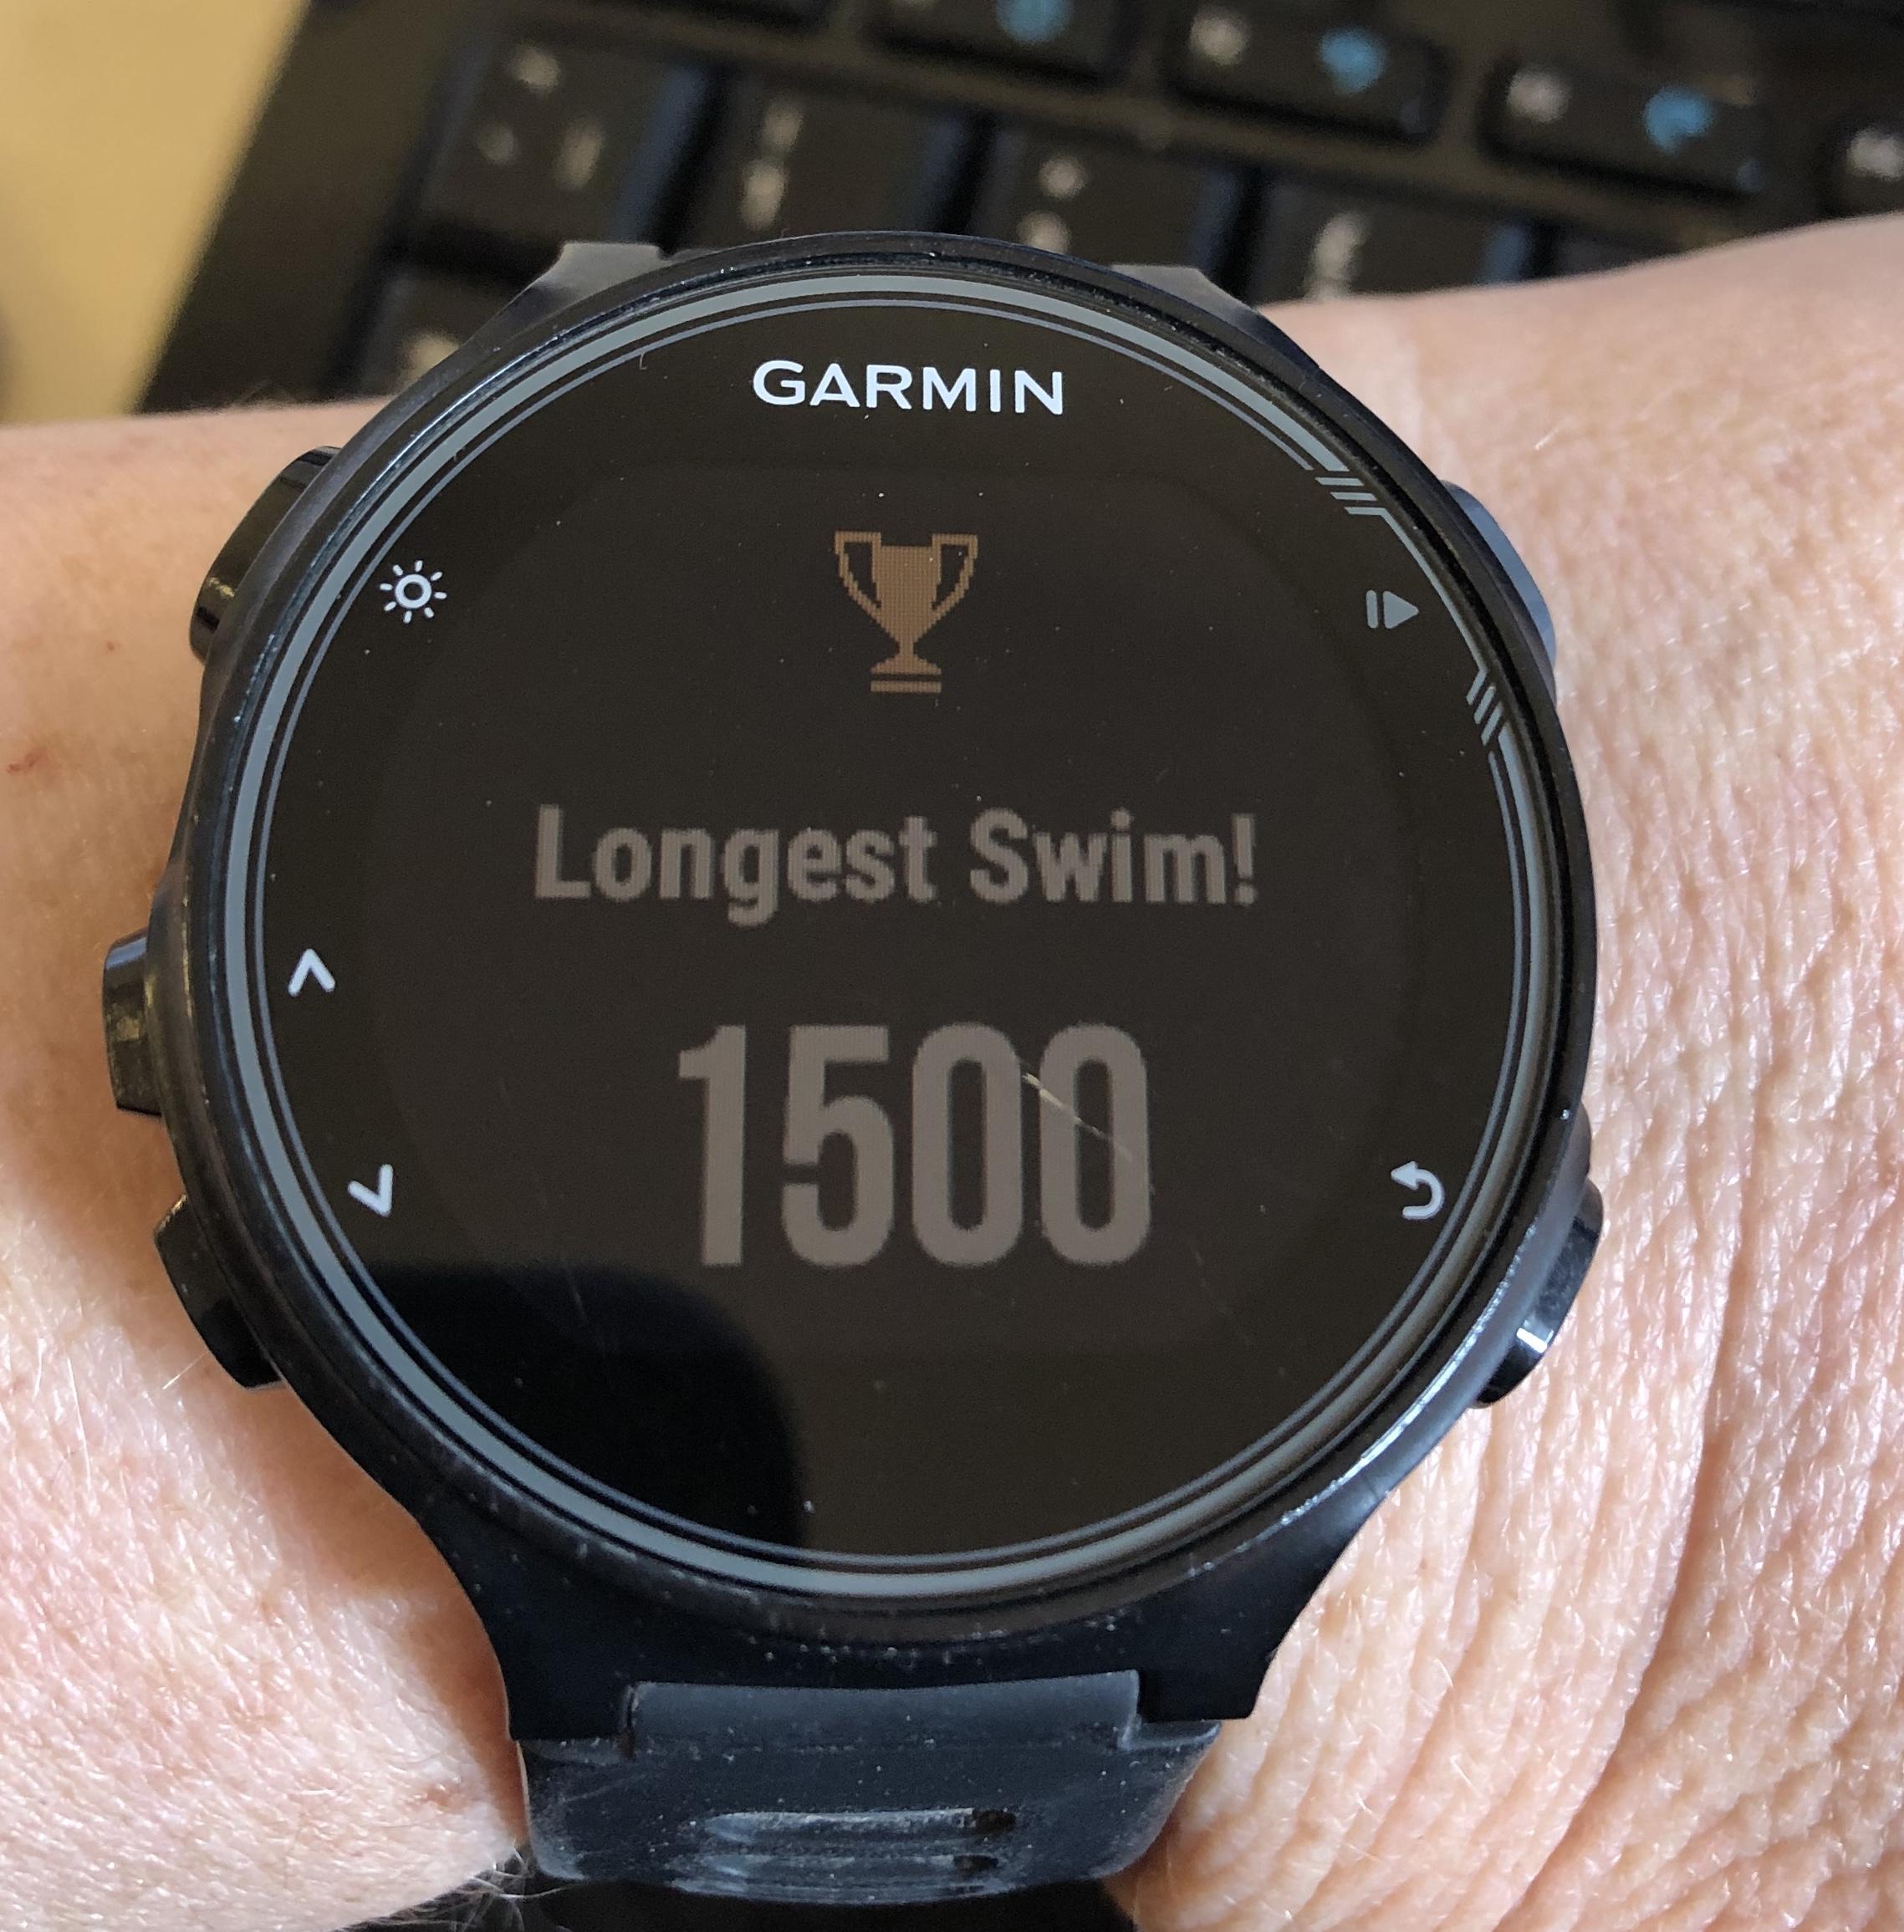 Watch 1500m swim